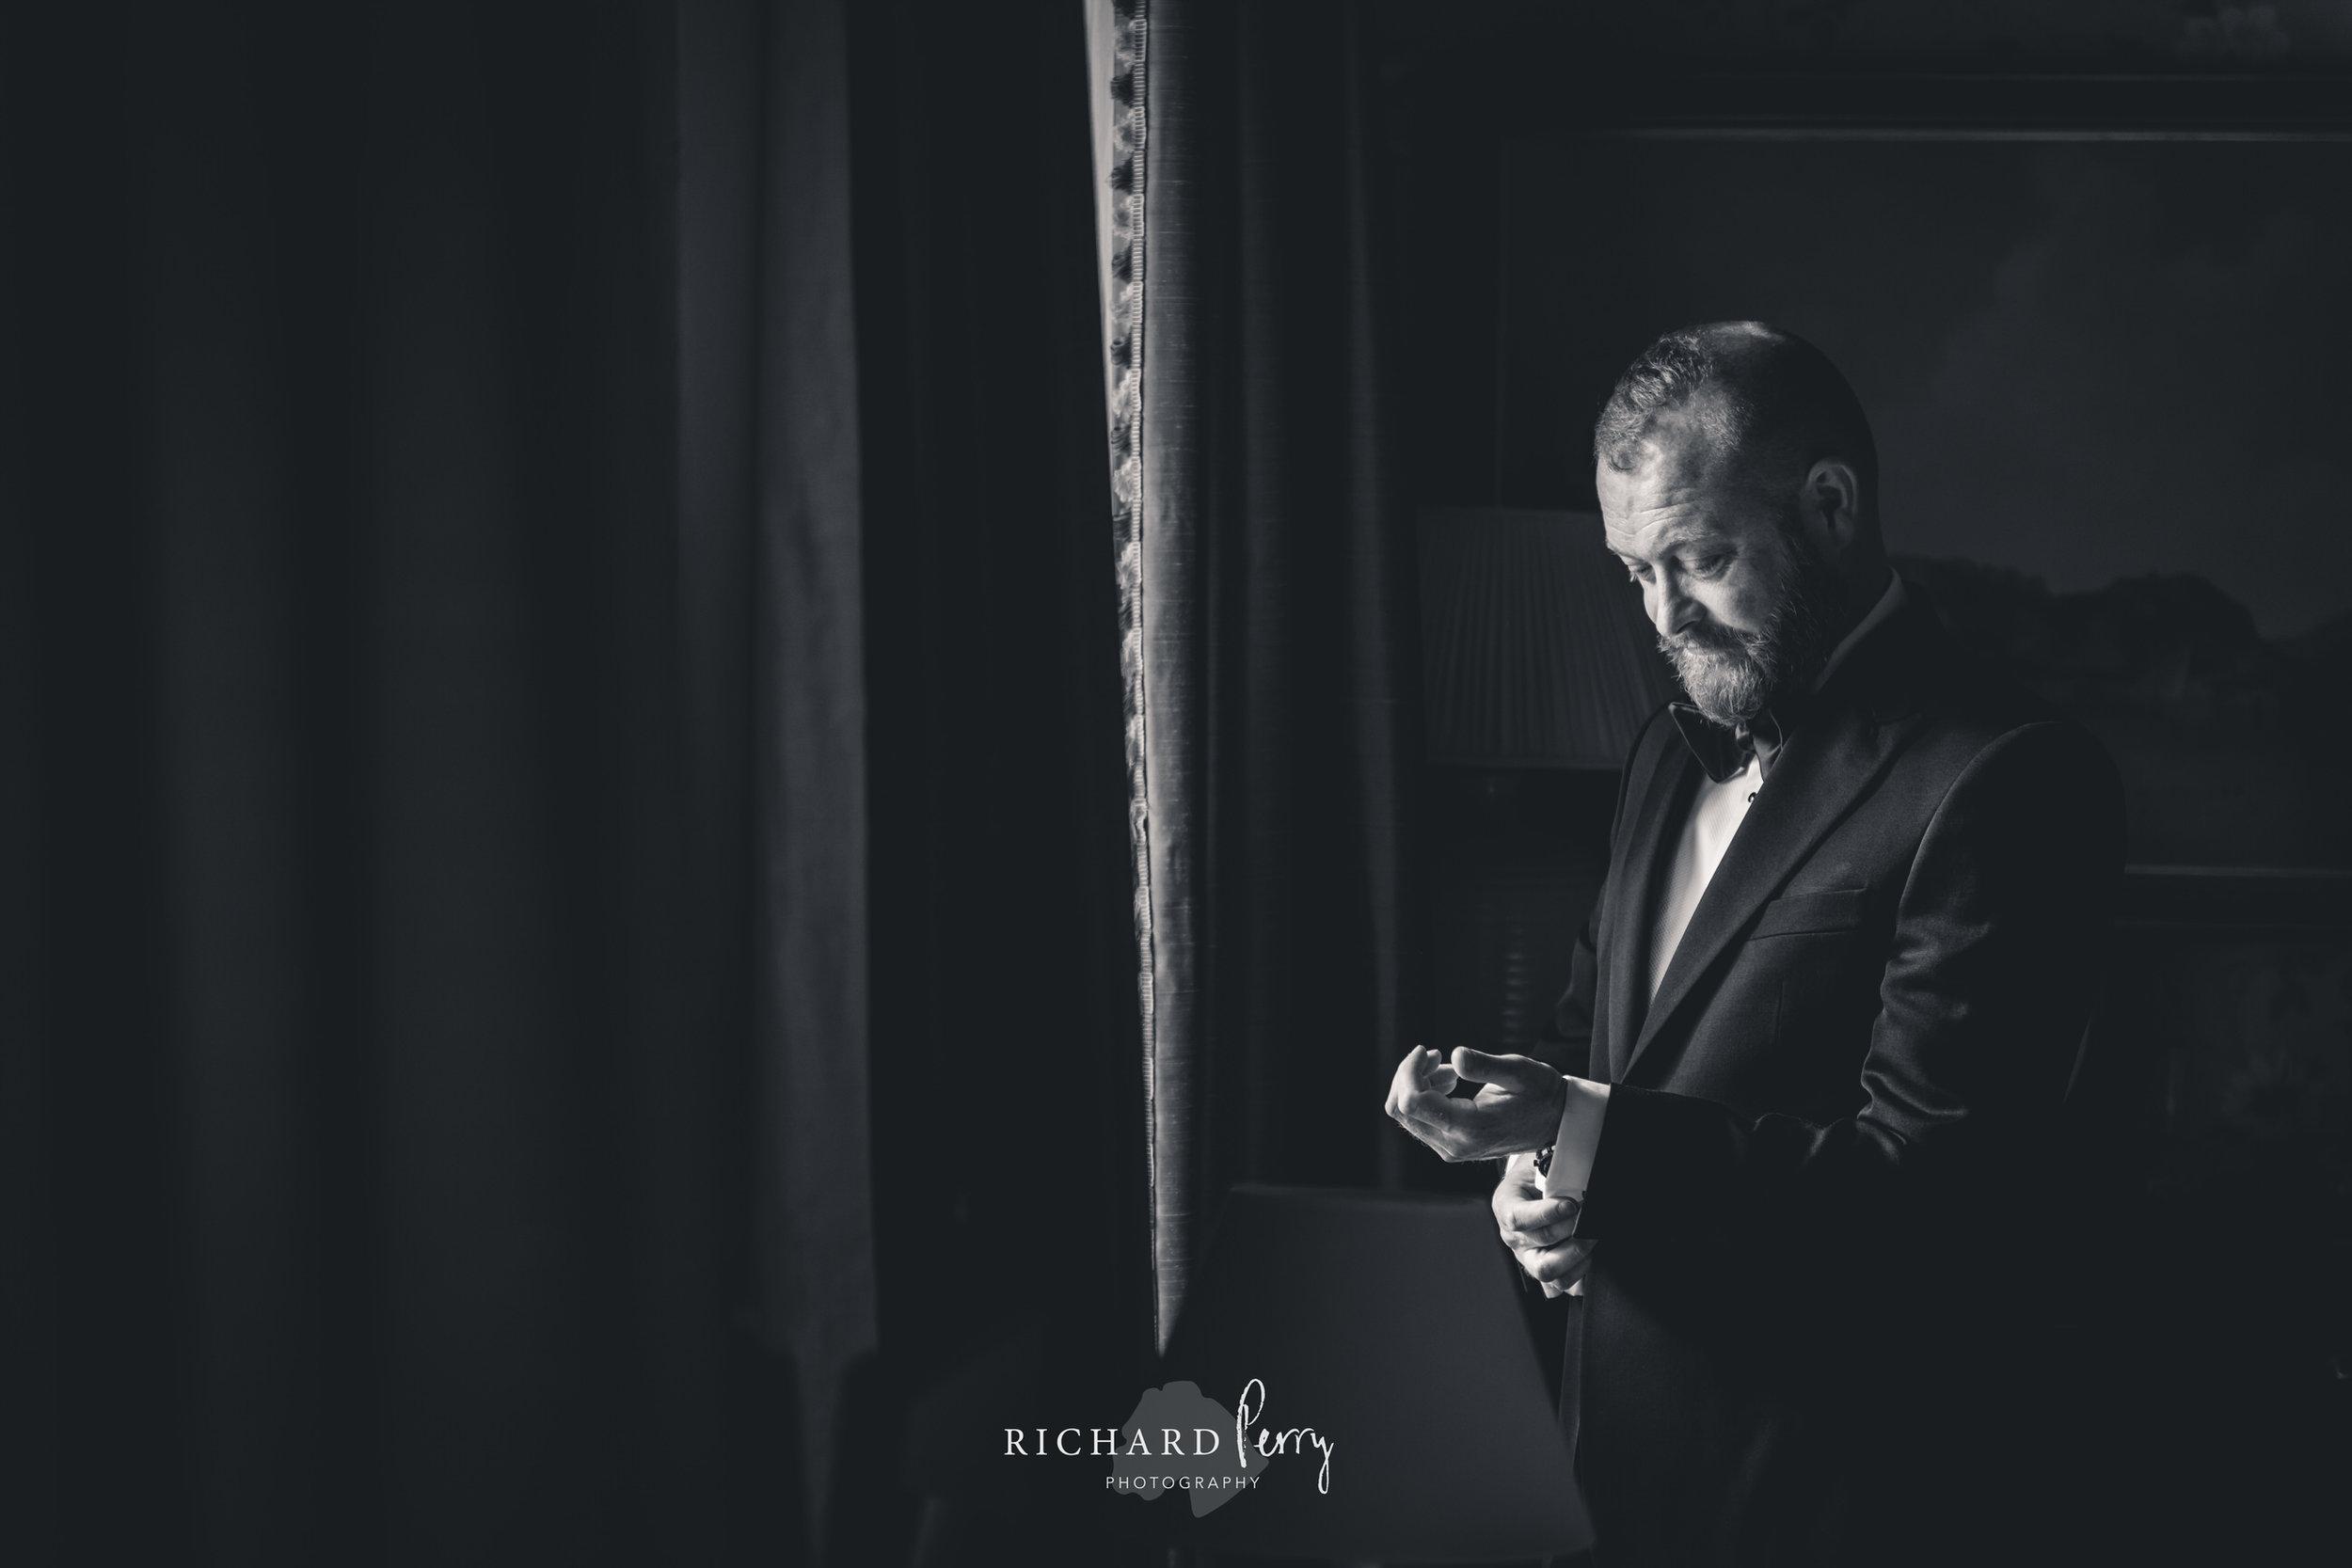 yorkshire-wedding-photographer-destination-archerfield-house-13.jpg